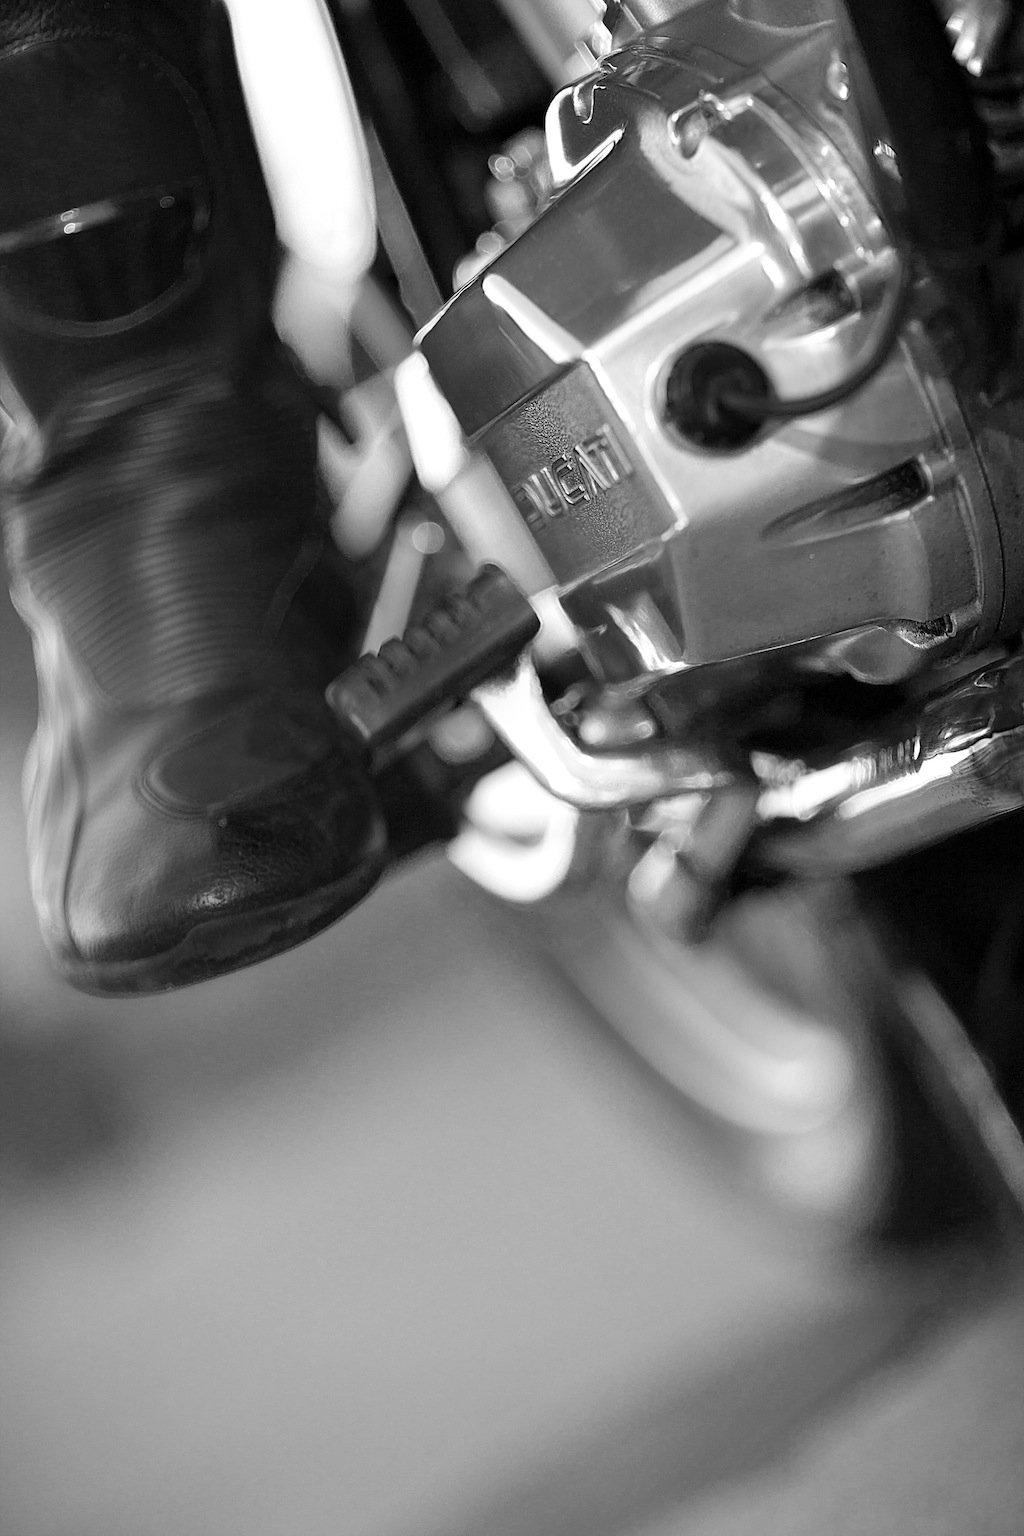 20R9943 copia Ducati 900 GTS de Nick Huber